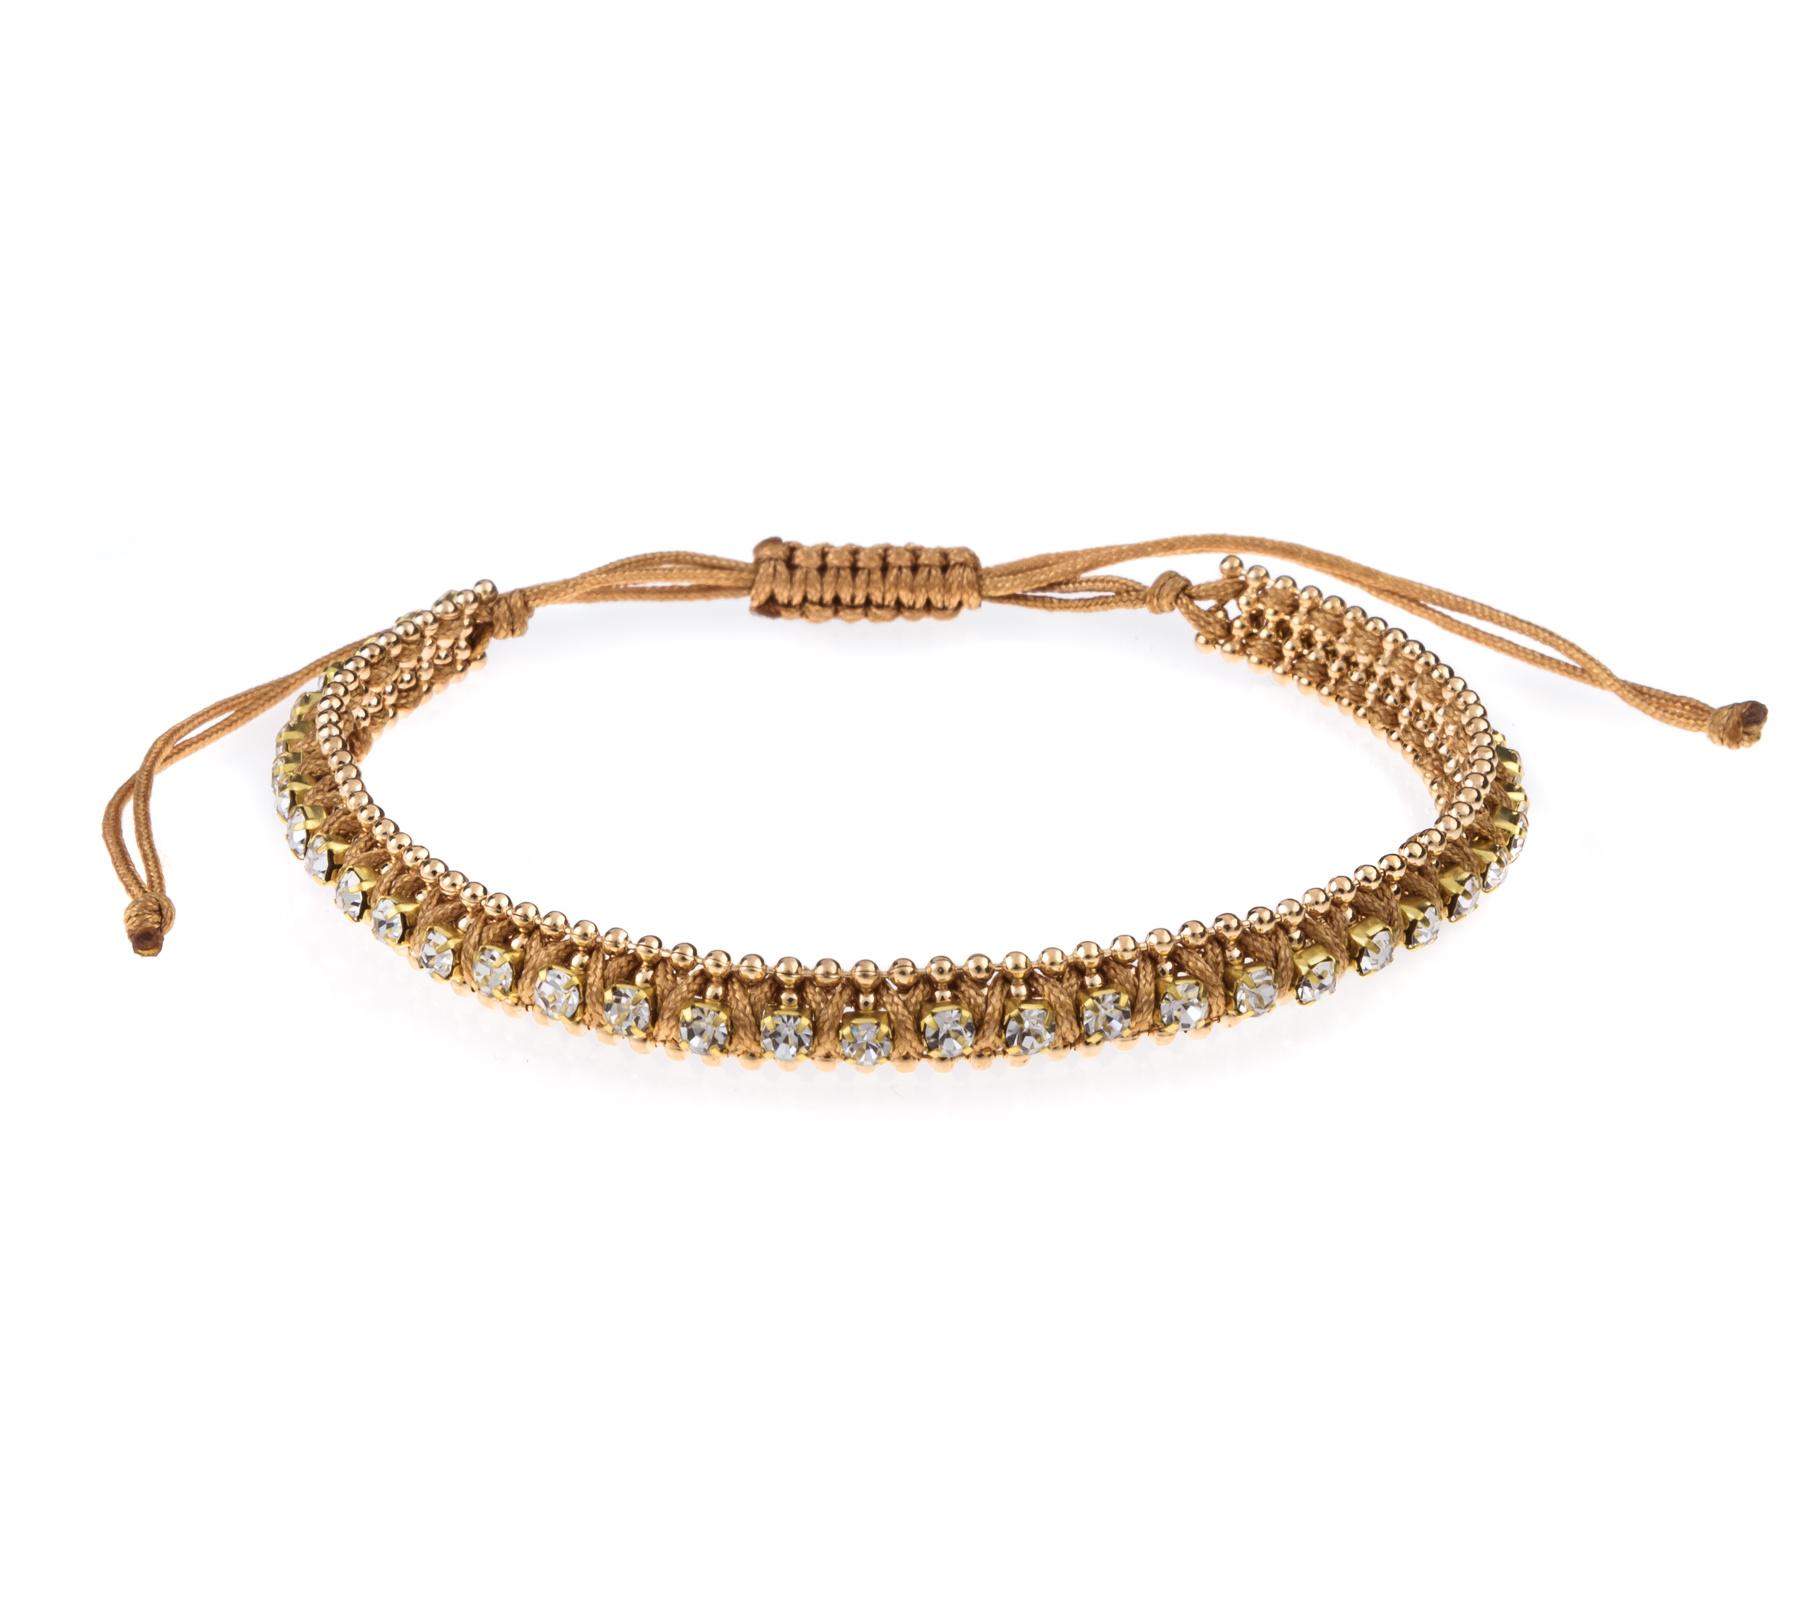 Armband met strass steentjes-2